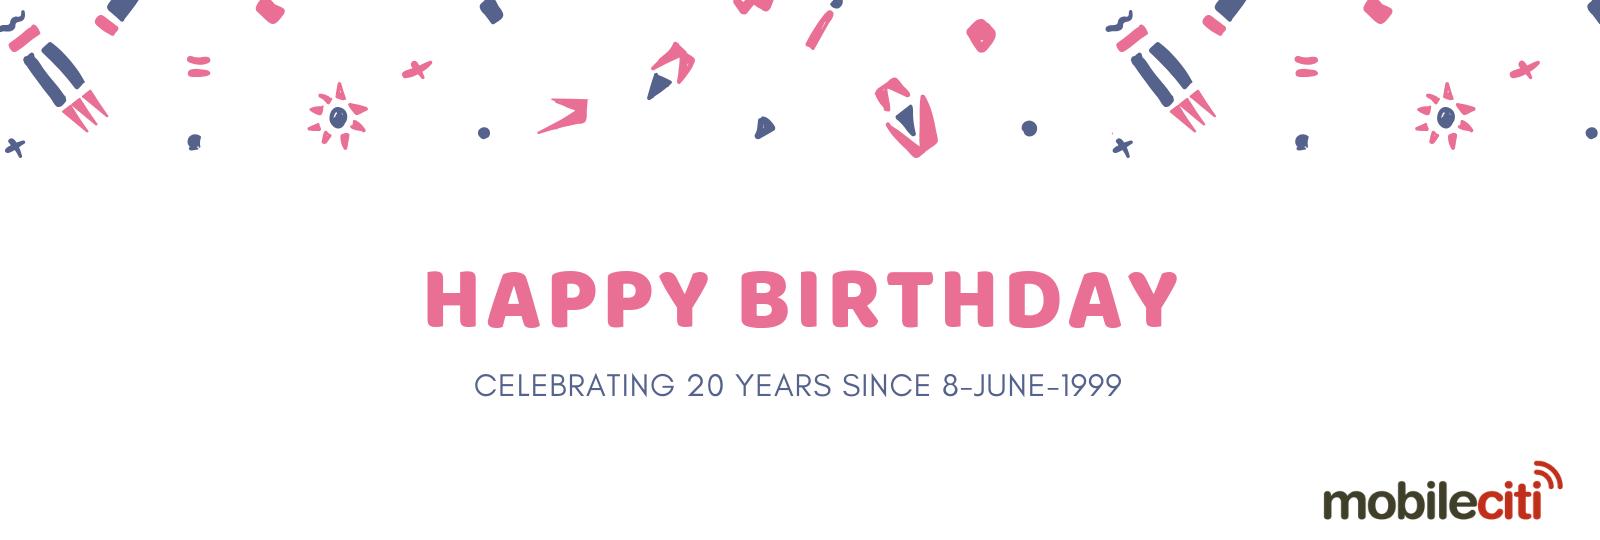 Mobileciti 20th Birthday